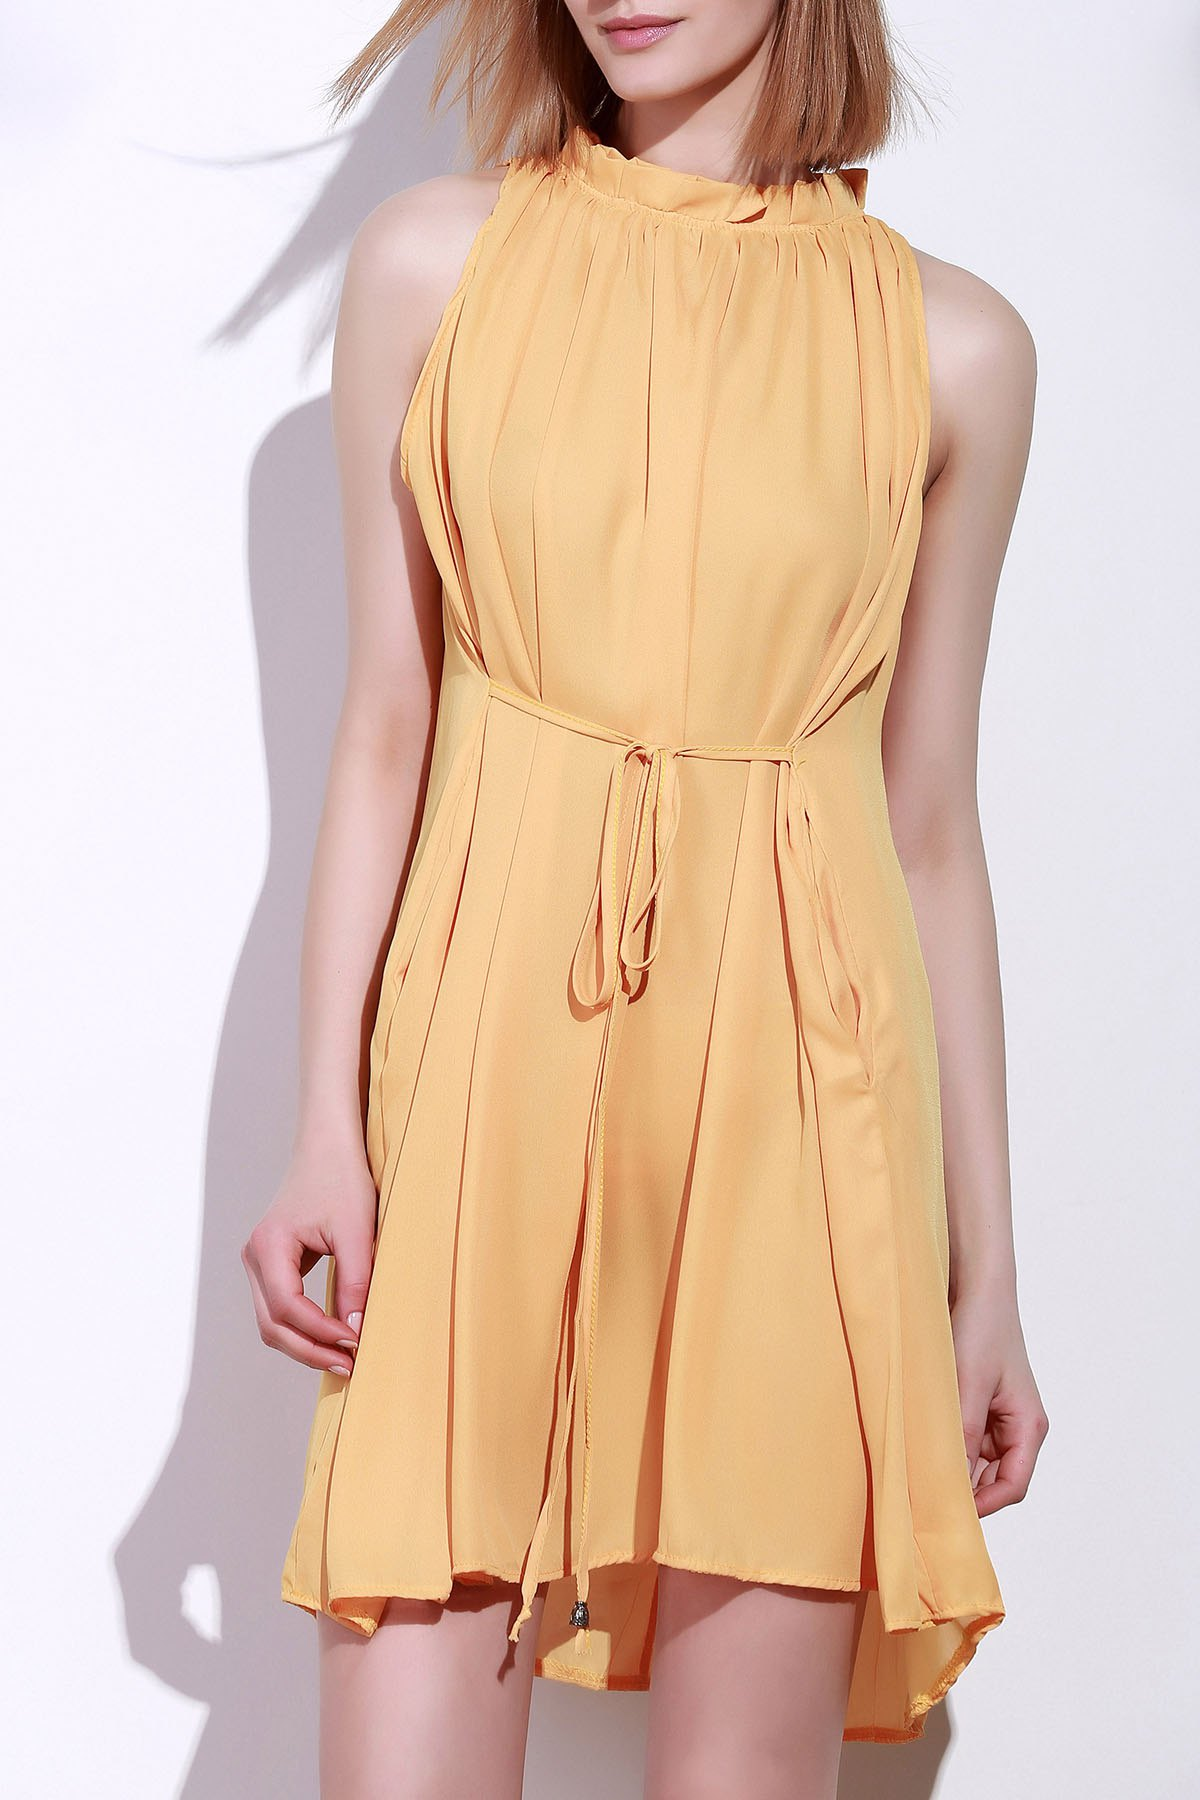 Round Neck Ruffle Tie-Up Sleeveless Dress - DEEP YELLOW S